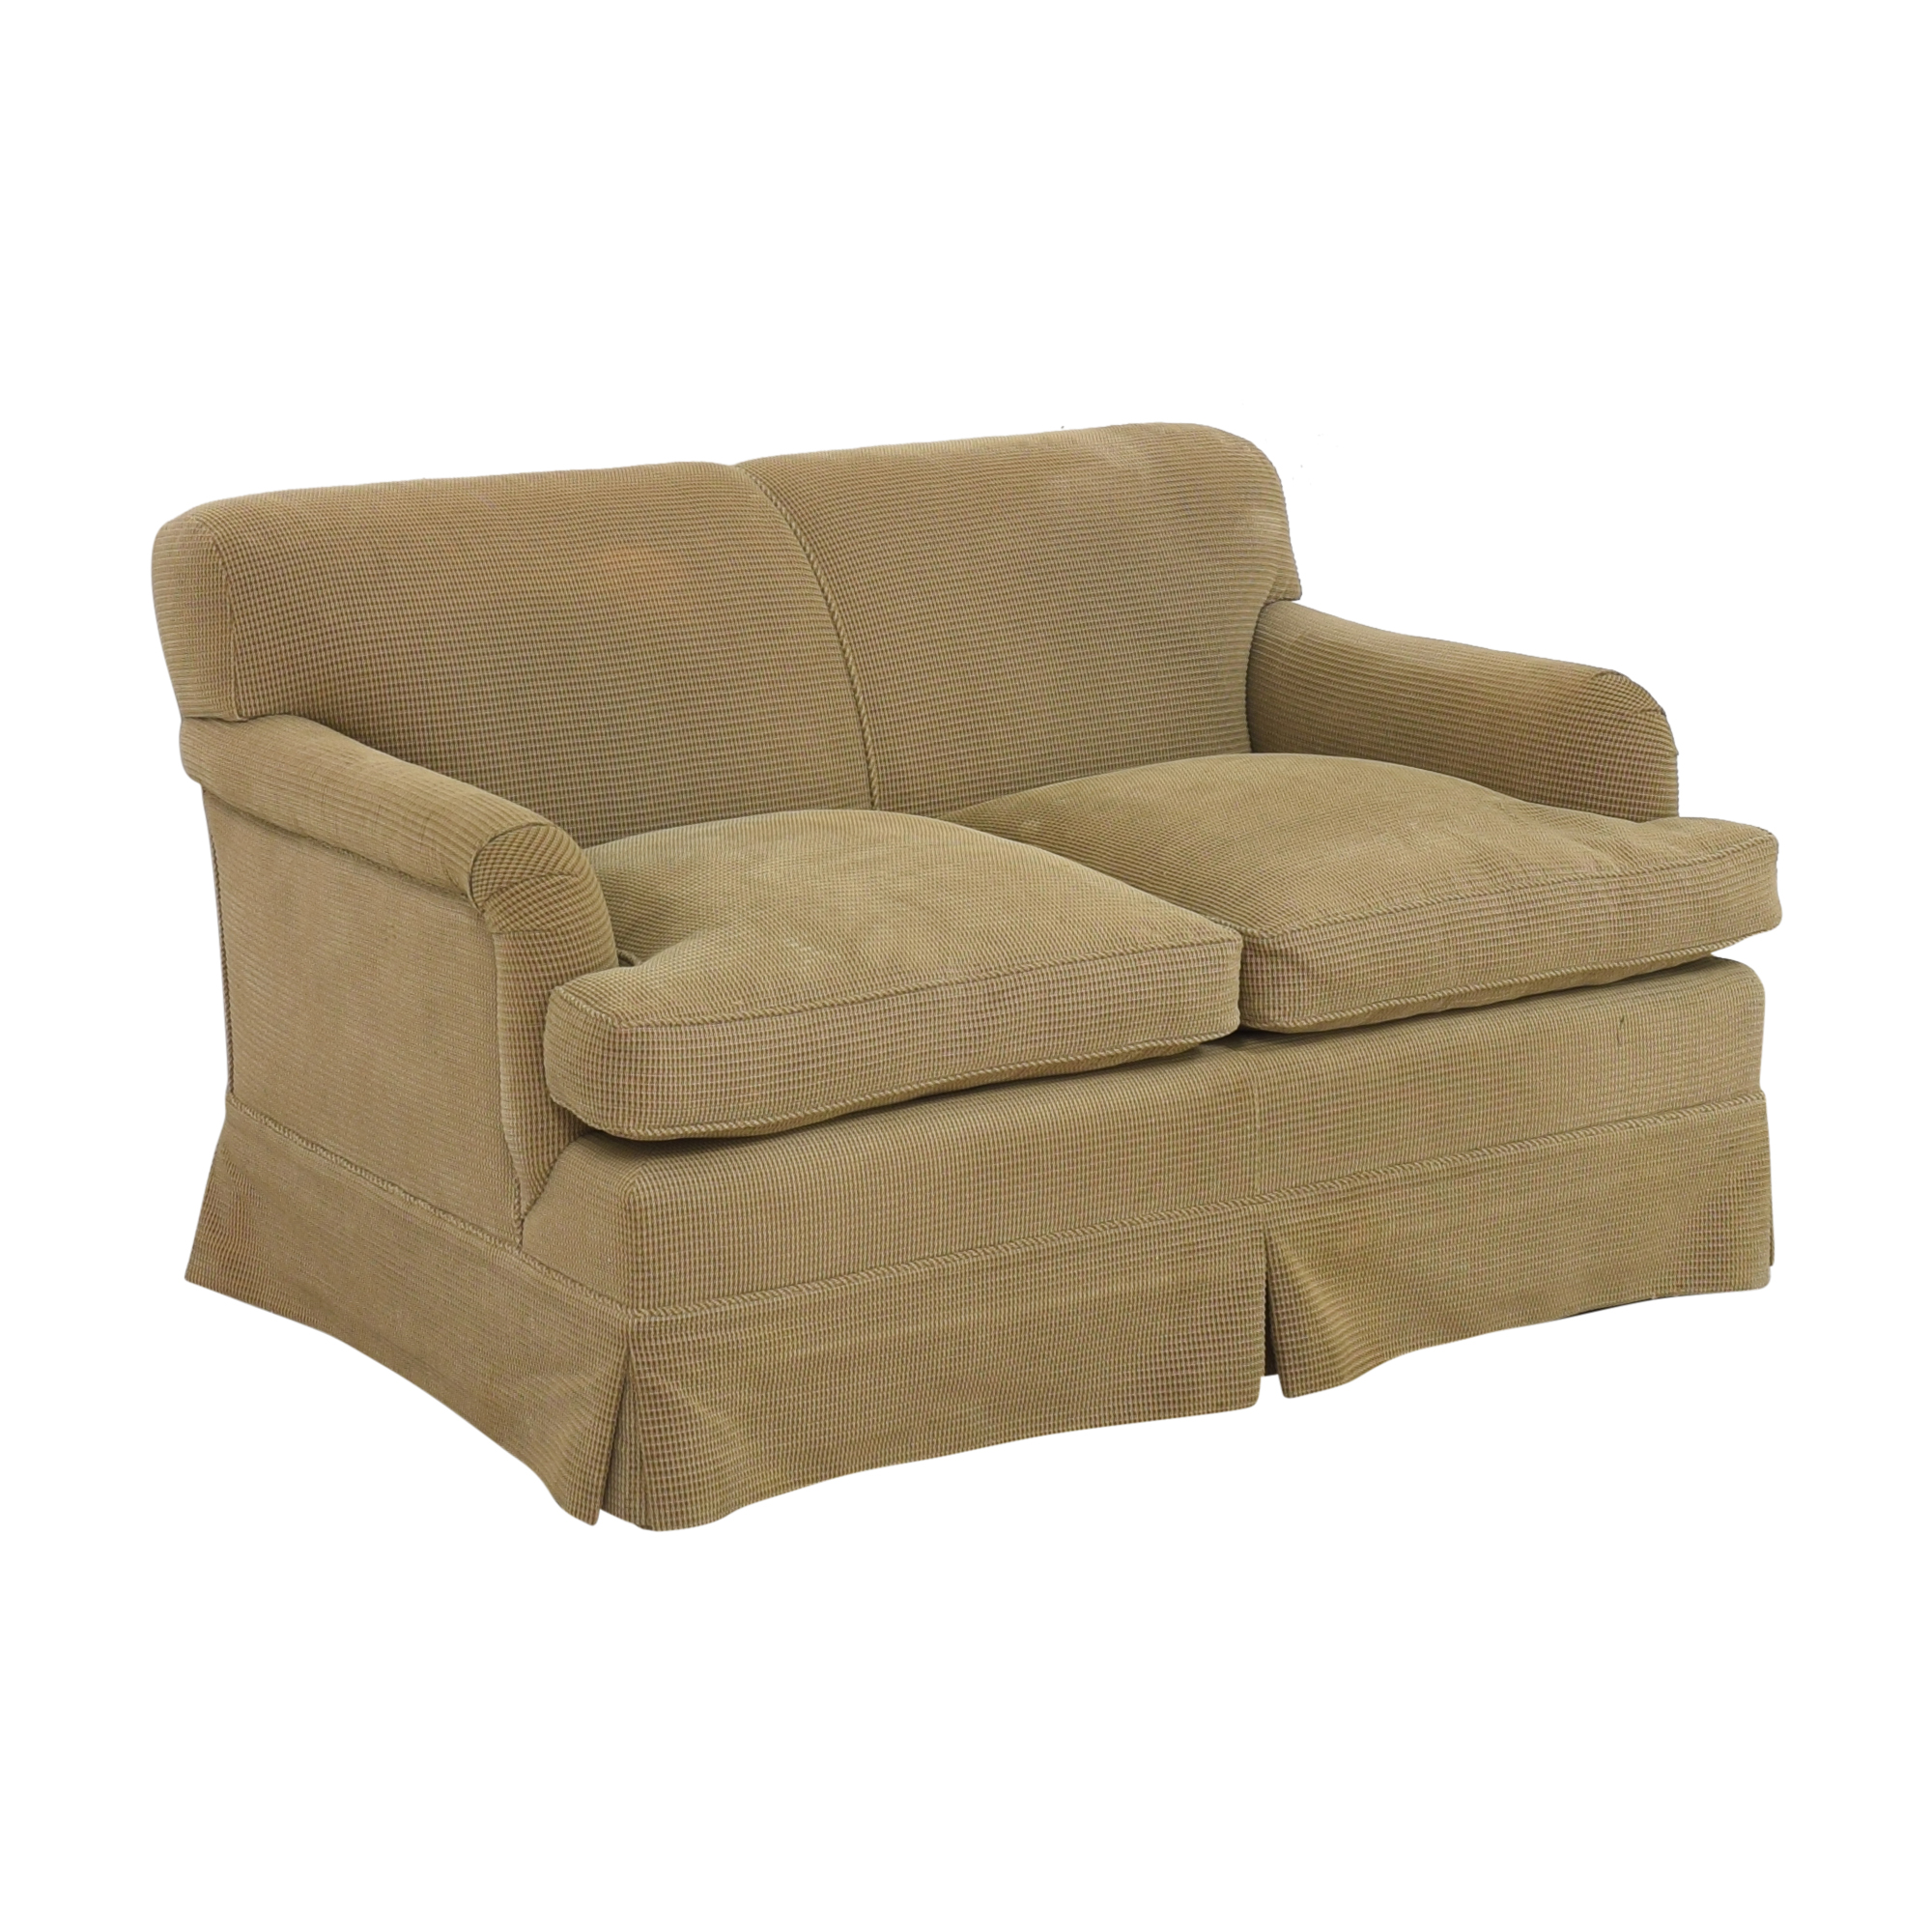 Custom Two Cushion Sofa for sale